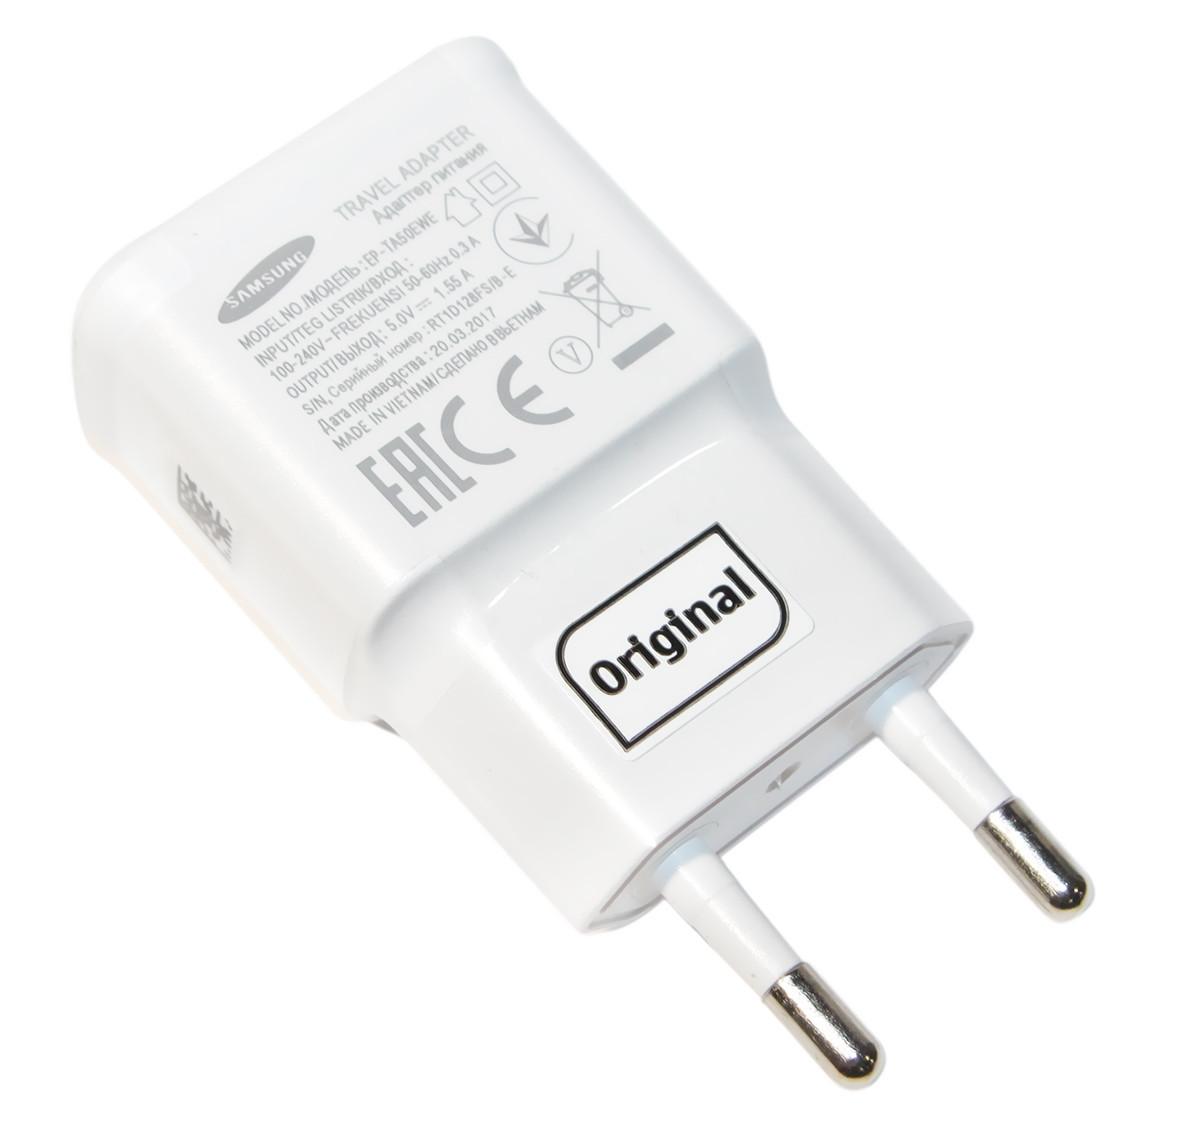 Зарядное устройство Samsung Travel Adapter, White, 1xUSB, 5V / 2A, Bulk (EP-TA50EWE), зарядка для смартфона, телефона